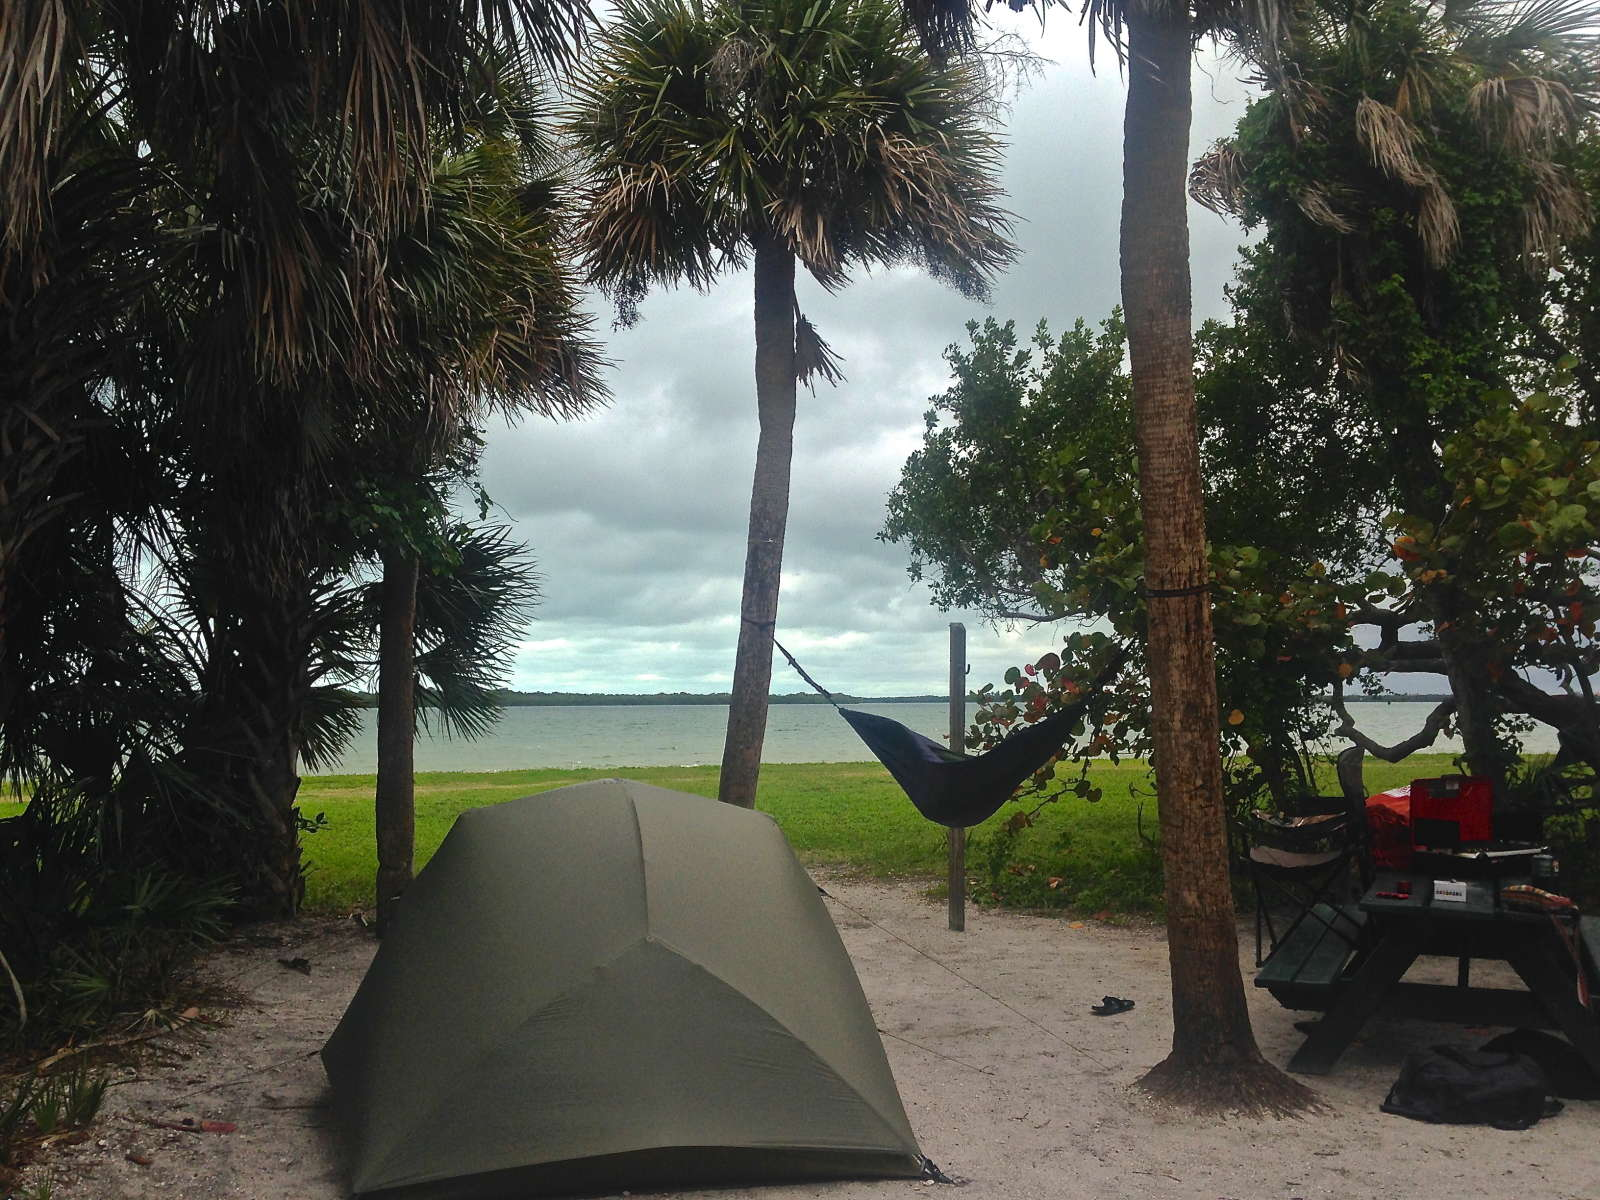 Fort De Soto Park Campground, Fort De Soto, FL: 5 Hipcamper Reviews And 29  Photos